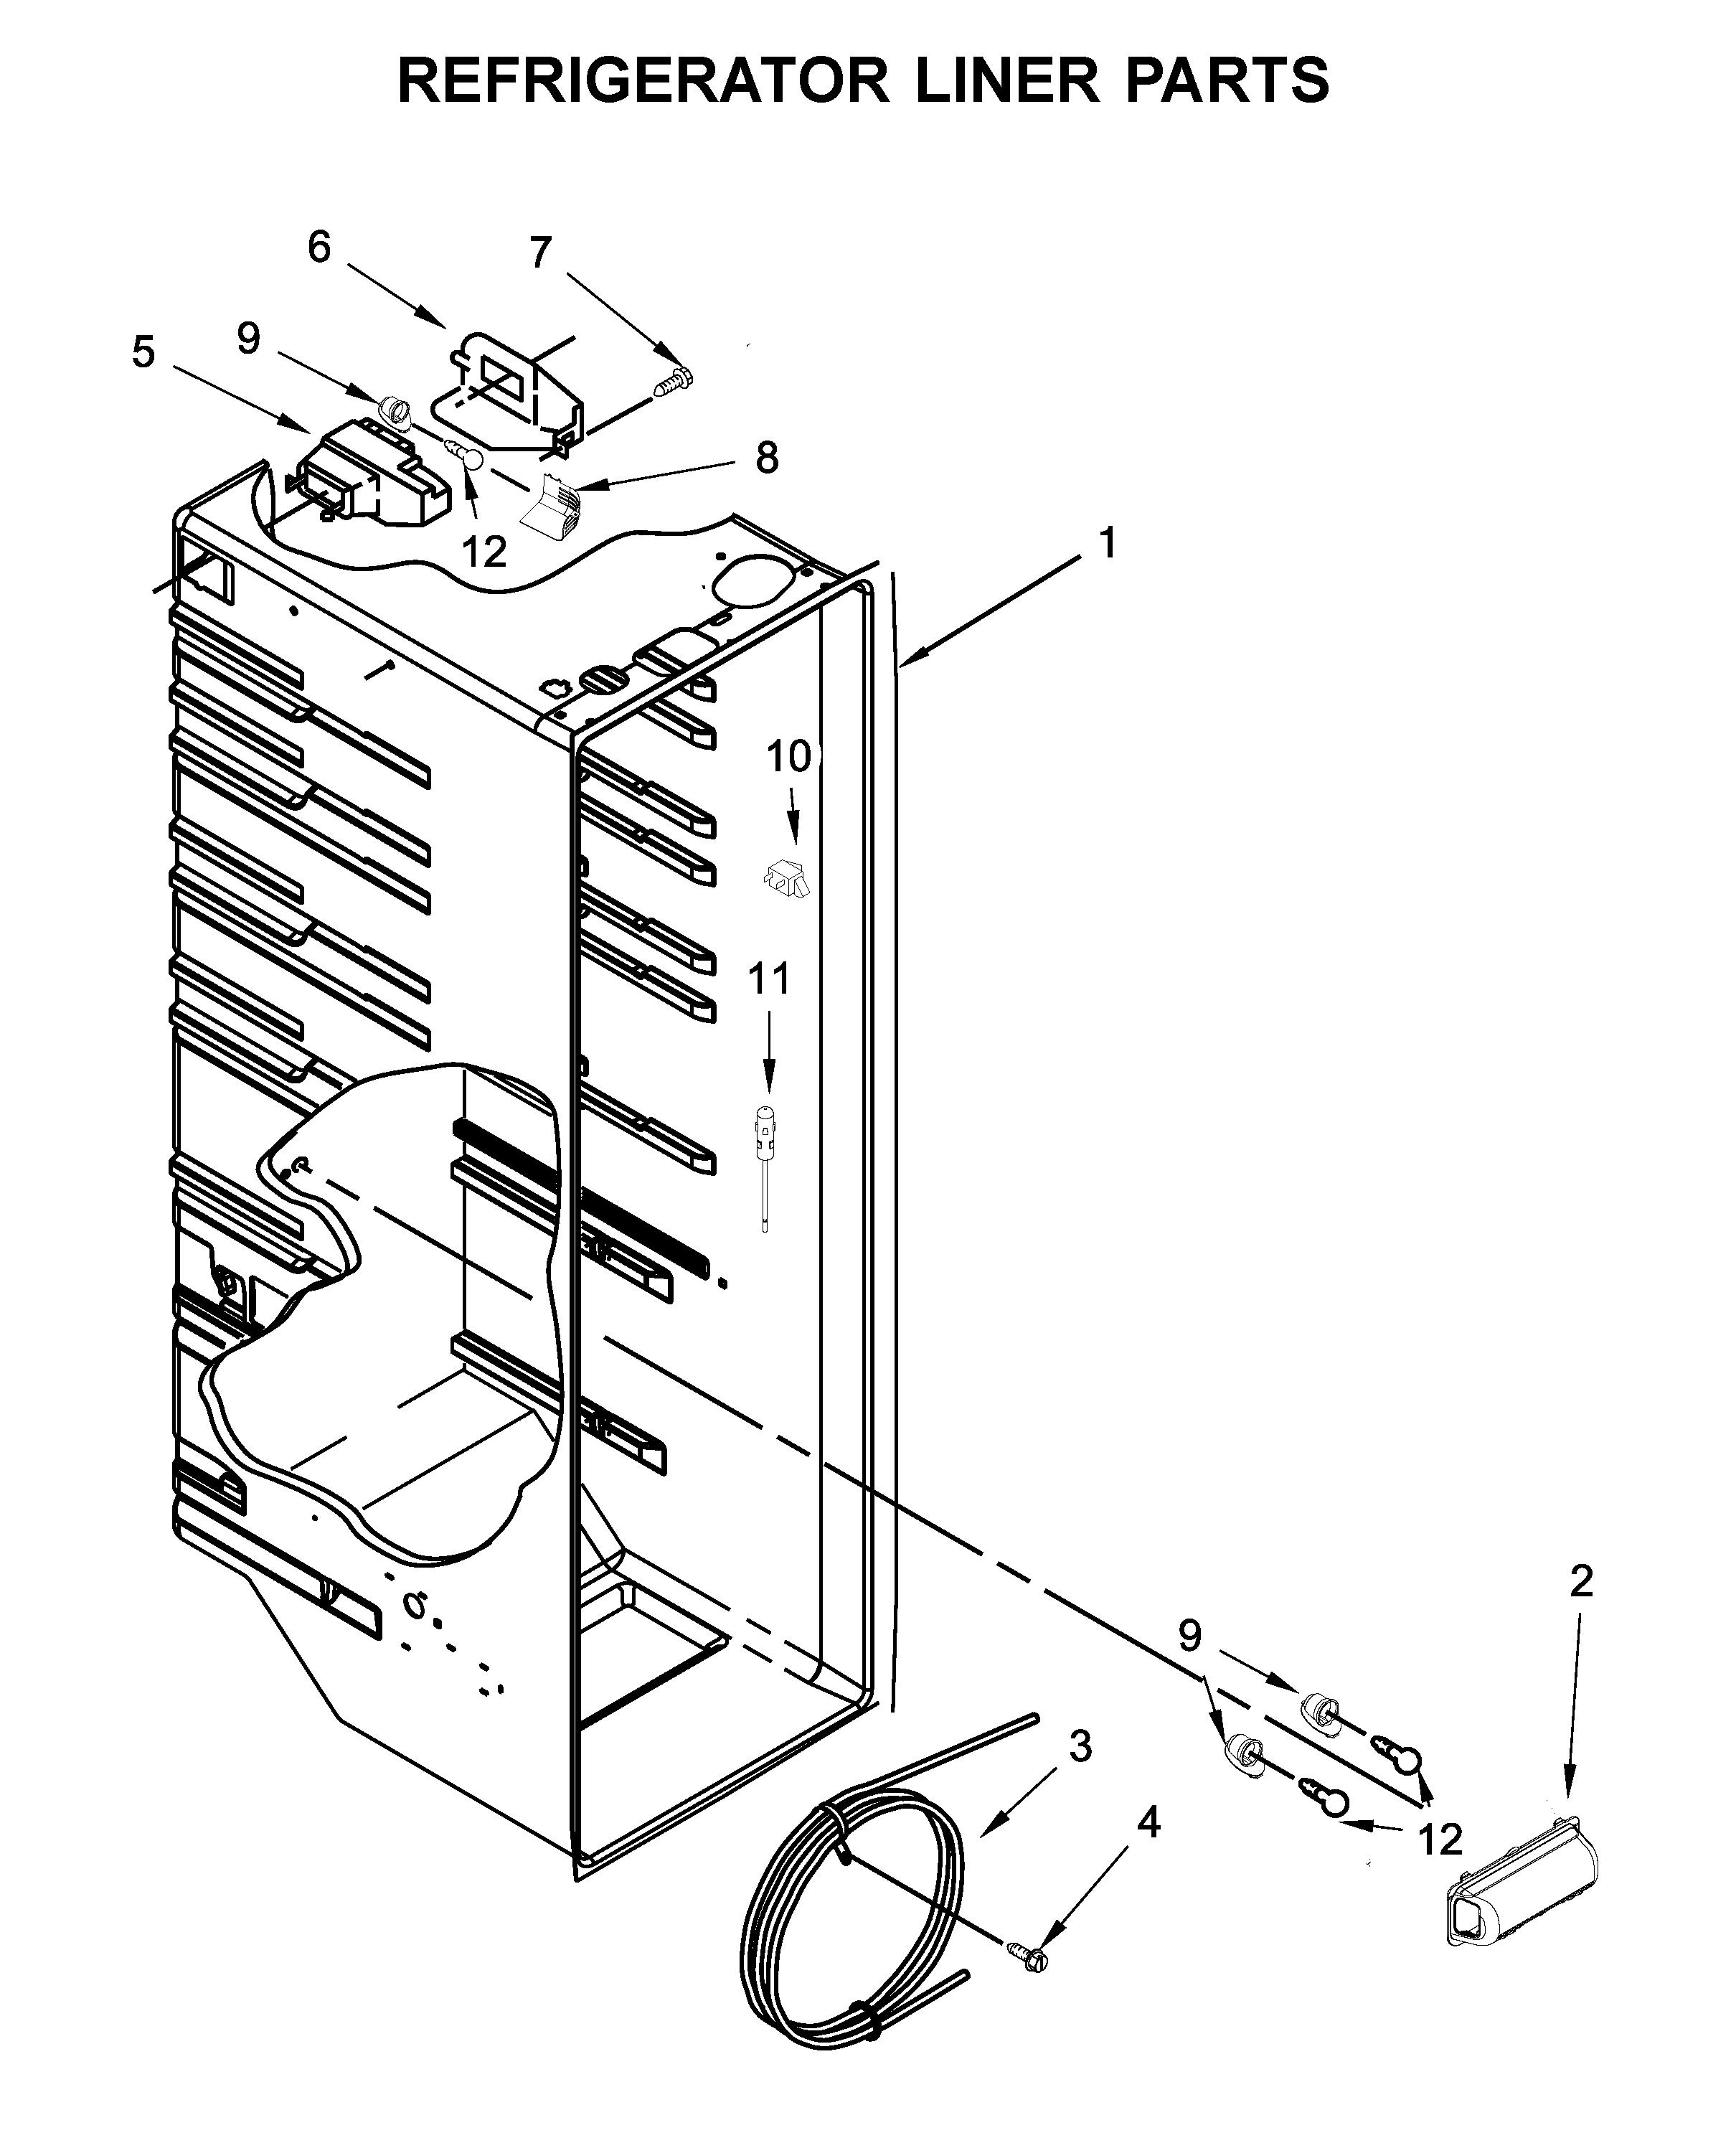 Kenmore  Refrigerator  Refrigerator liner parts